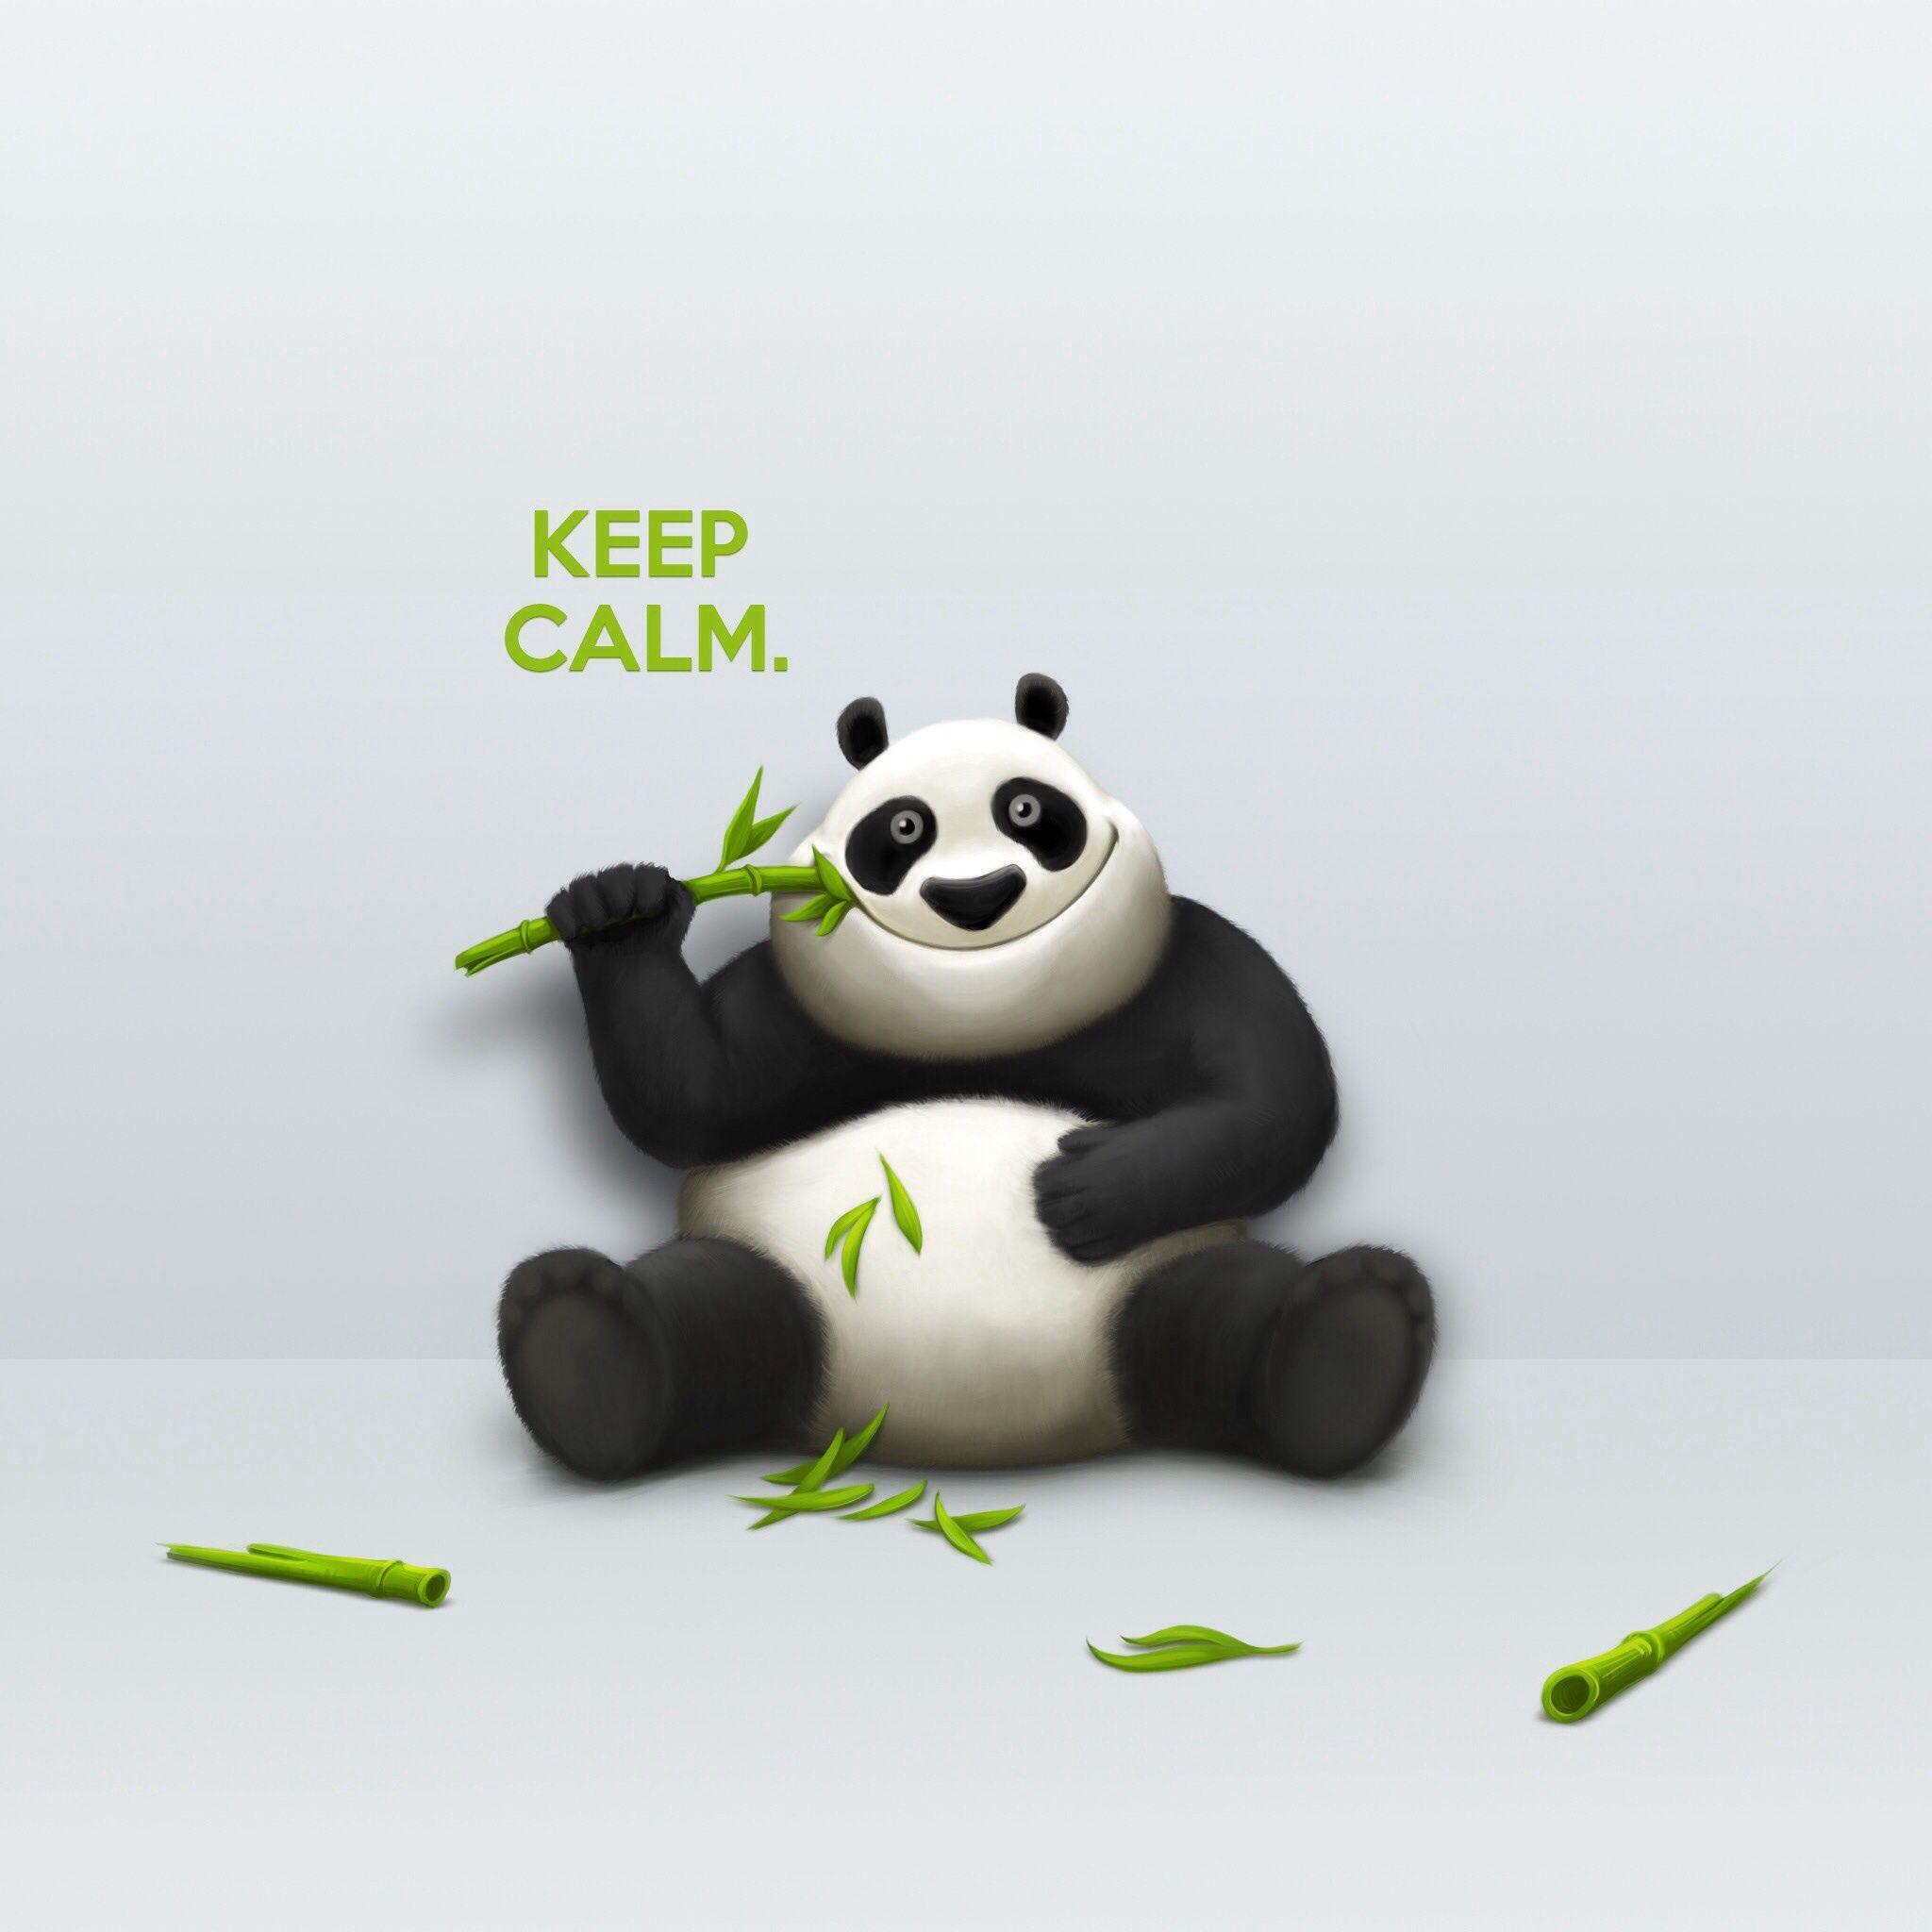 Keep Calm Funny Wallpaper Cool Cartoons Panda Artwork